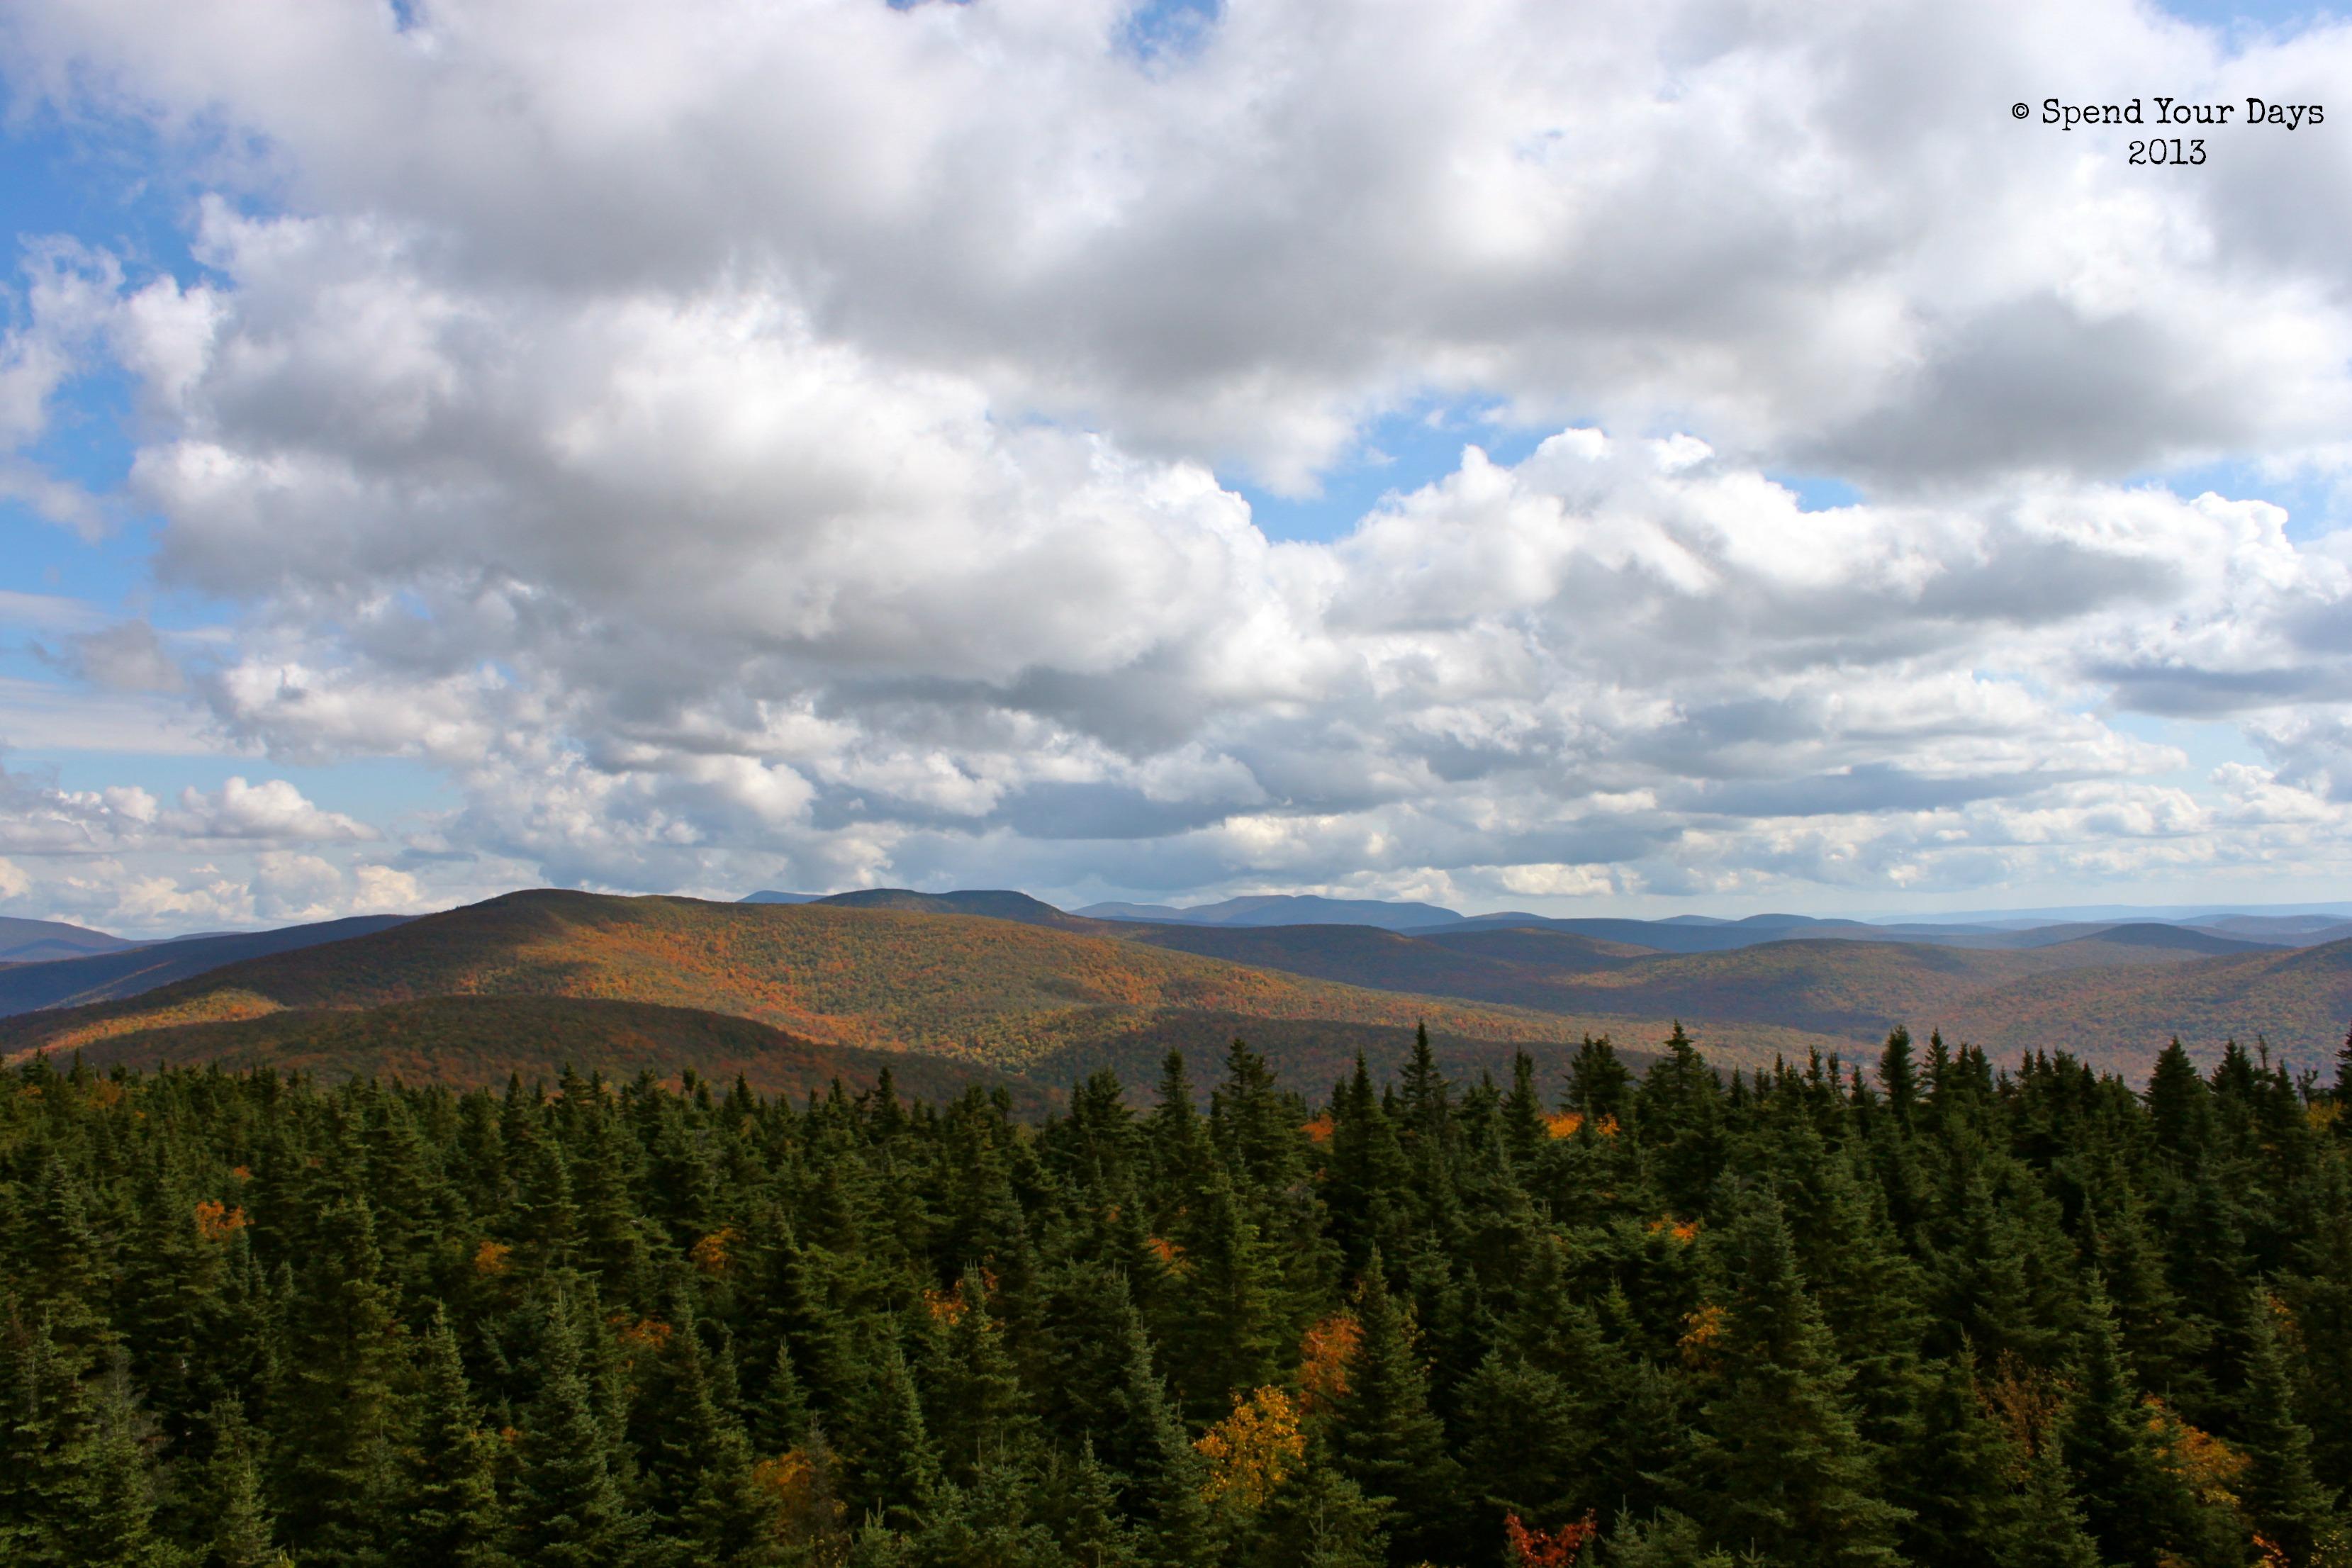 catskills mountain ny balsam lake mountain fire tower